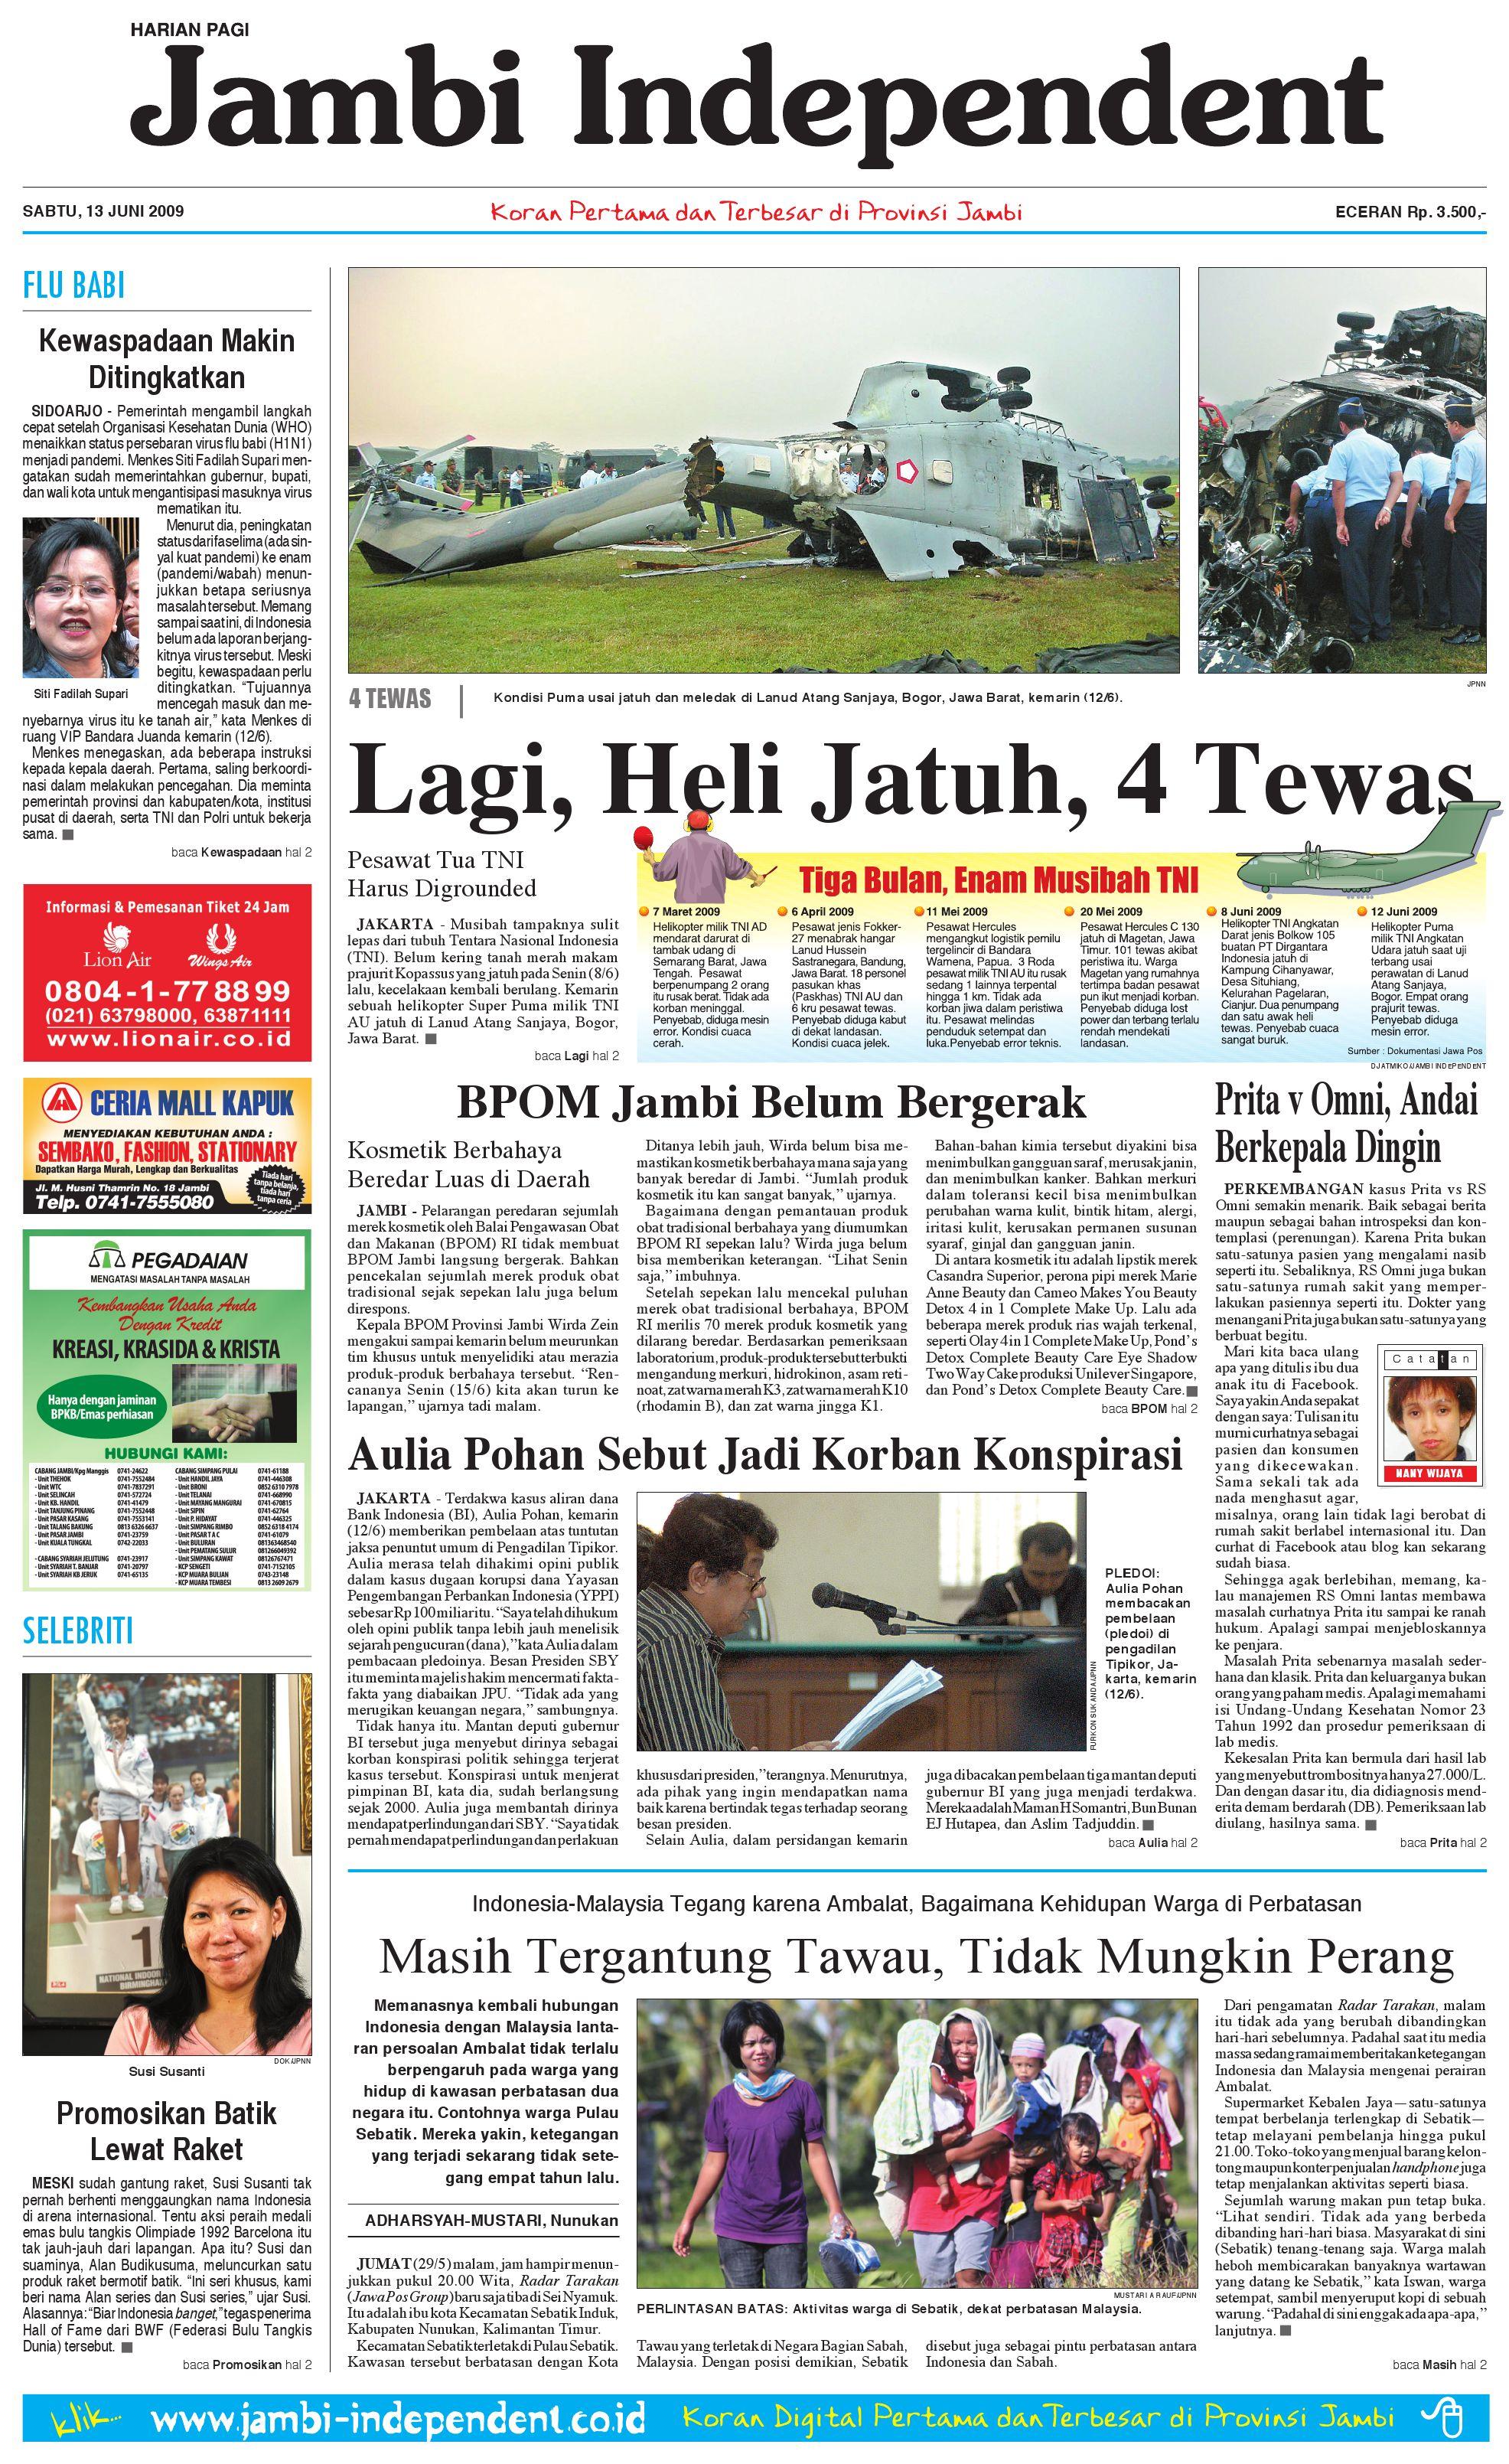 Jambi Independent edisi 13 Juni 2009 by jambi independent - issuu 1dc1004df3